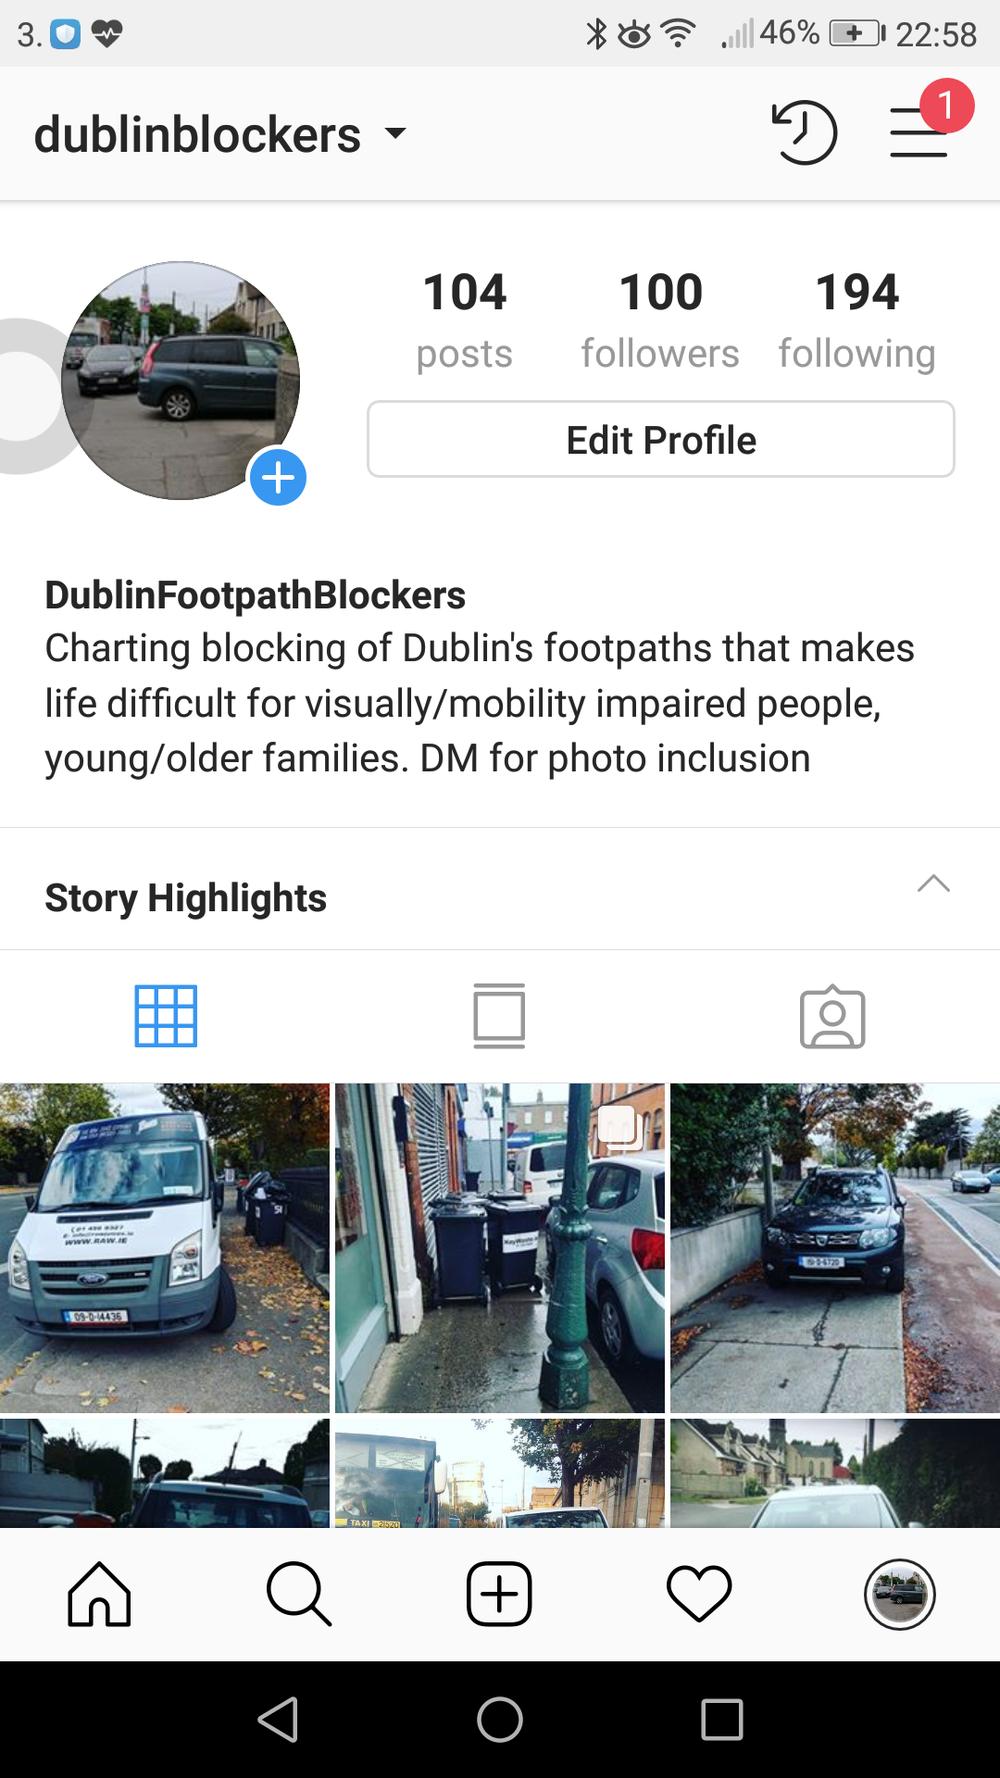 Instagram page of Dublin Blockers